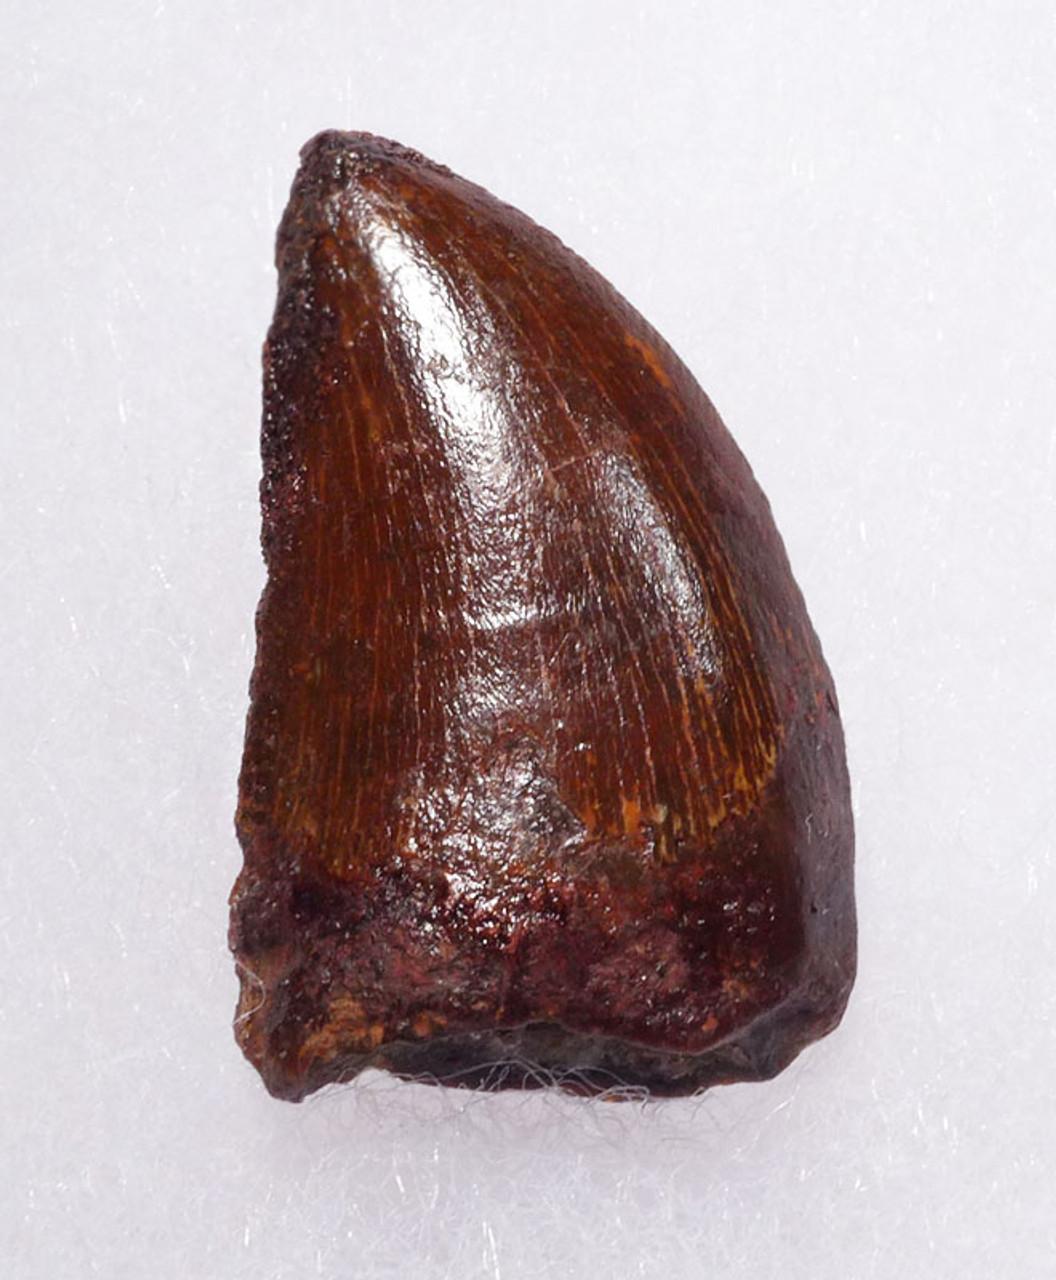 BEAUTIFUL 1.45 INCH UNBROKEN CARCHARODONTOSAURUS FOSSIL DINOSAUR TOOTH *DT2-100